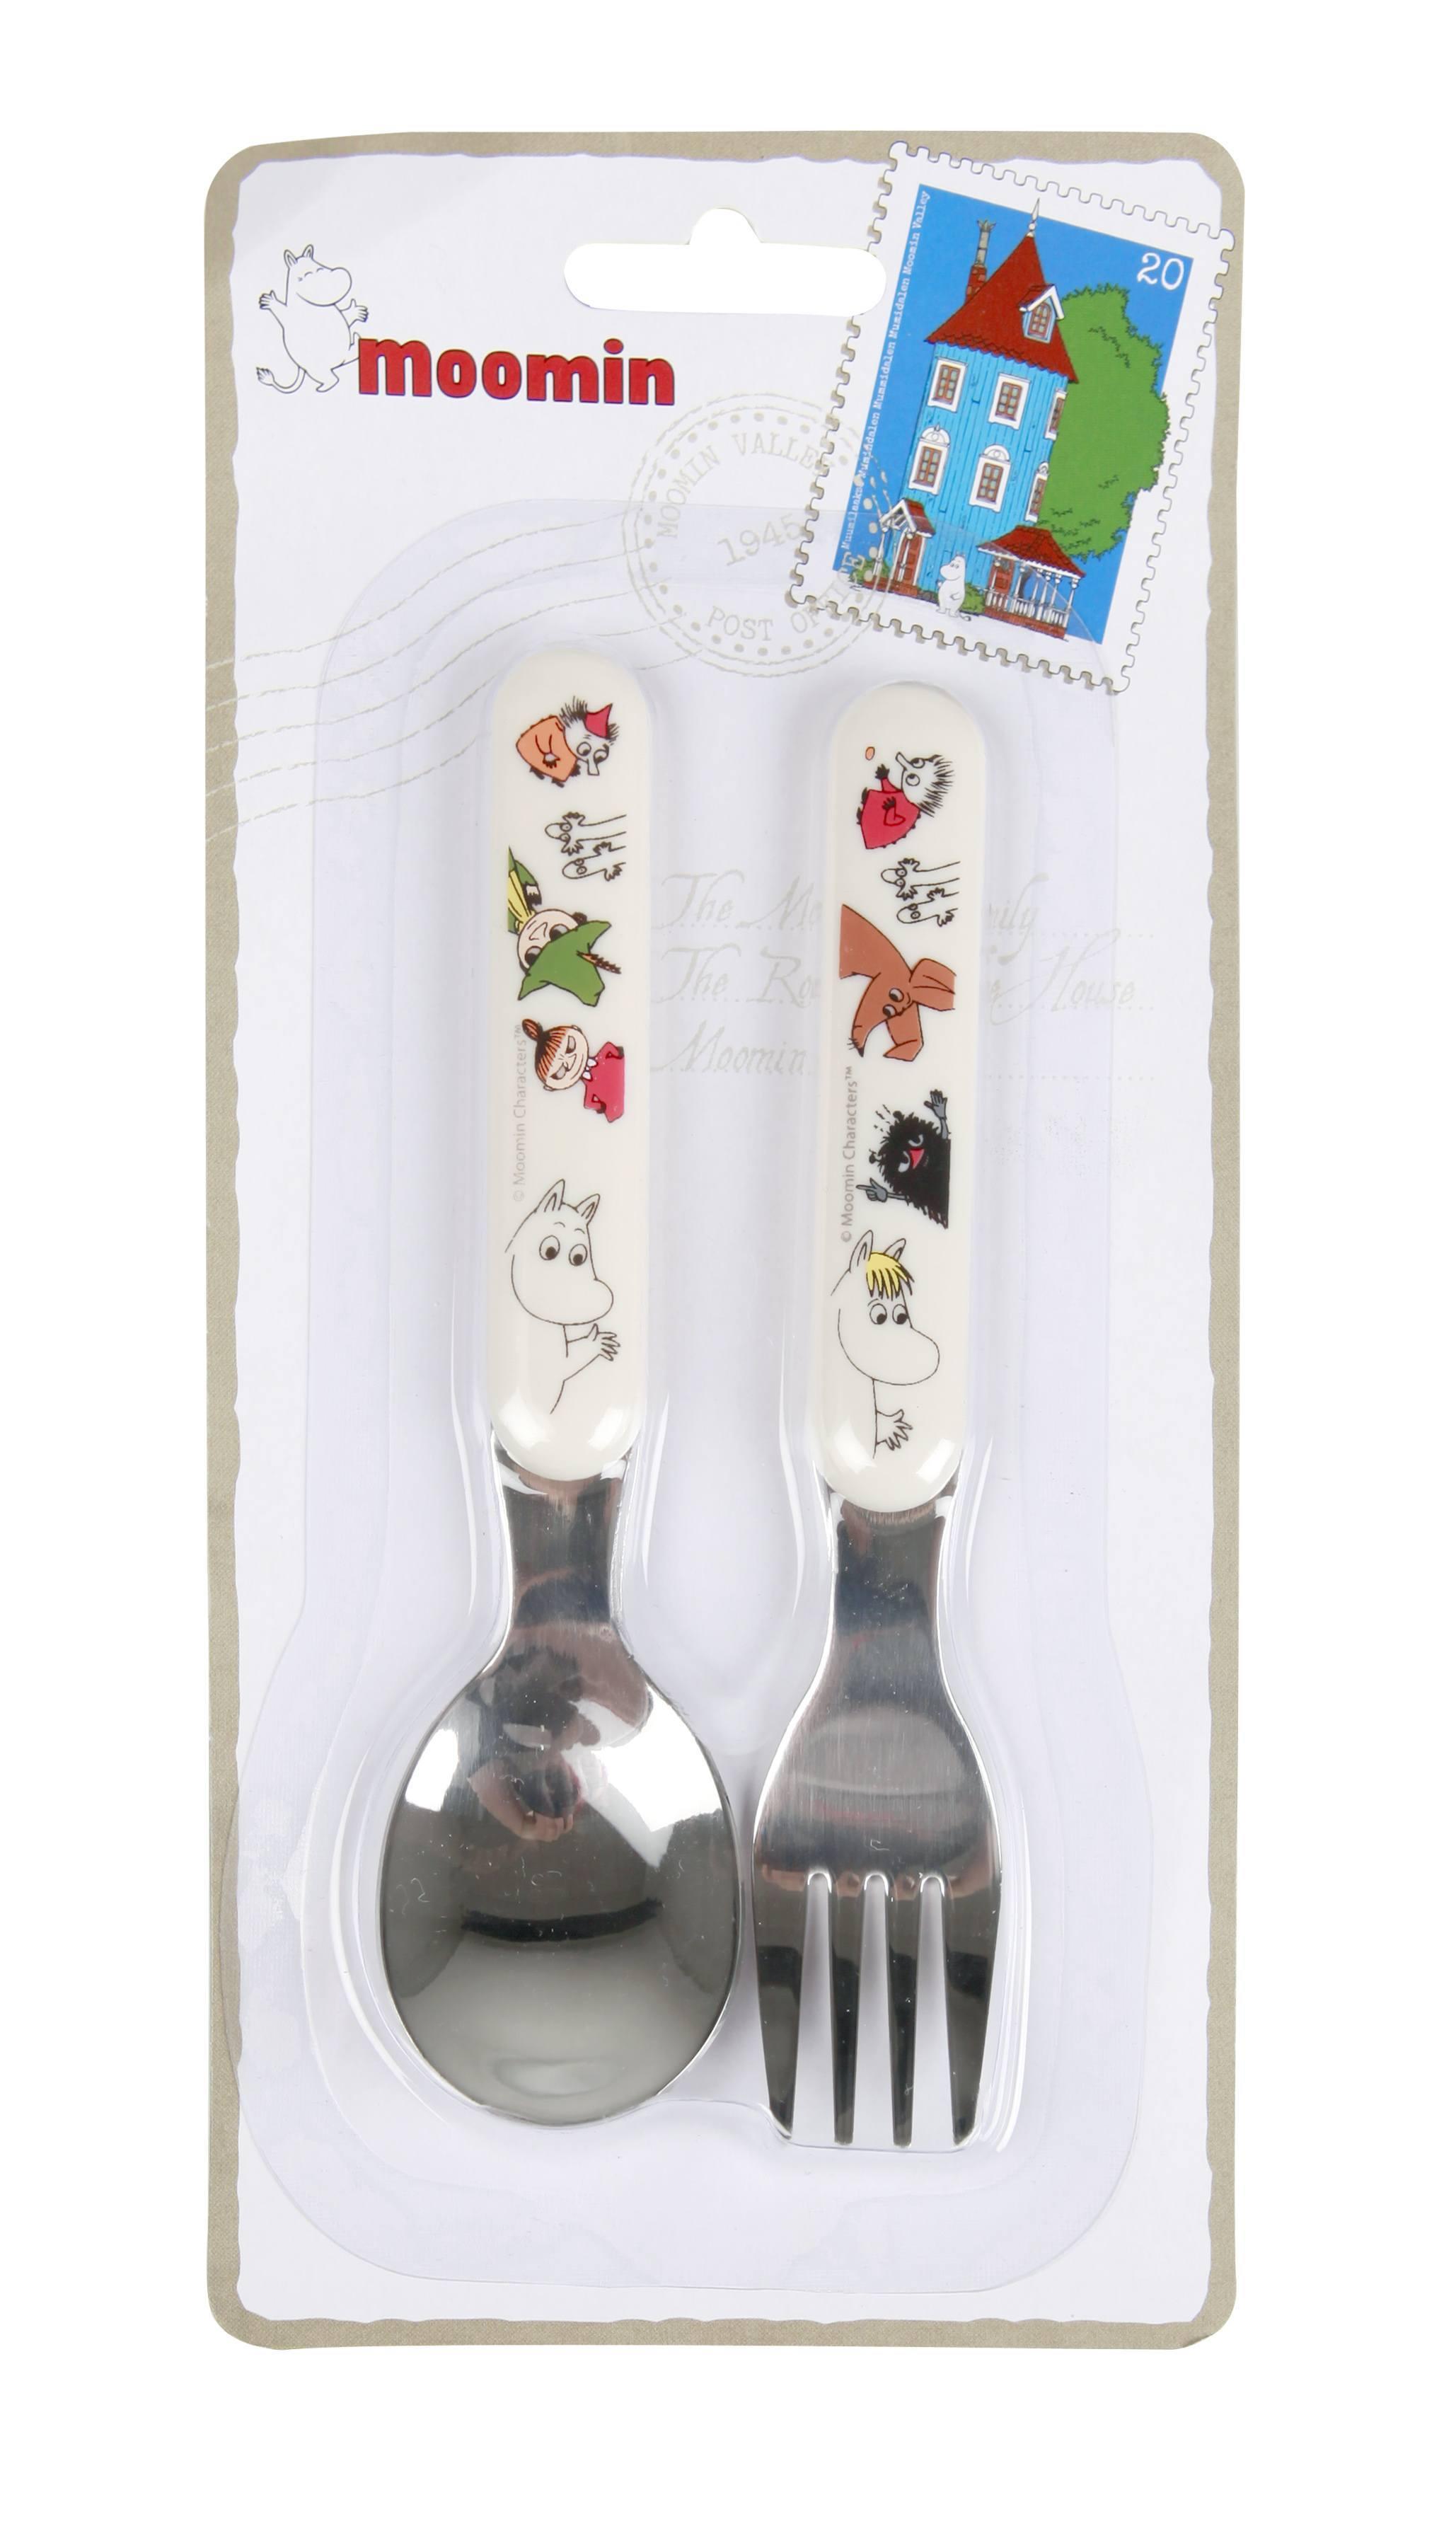 Martinex Moomin Spoon & Fork